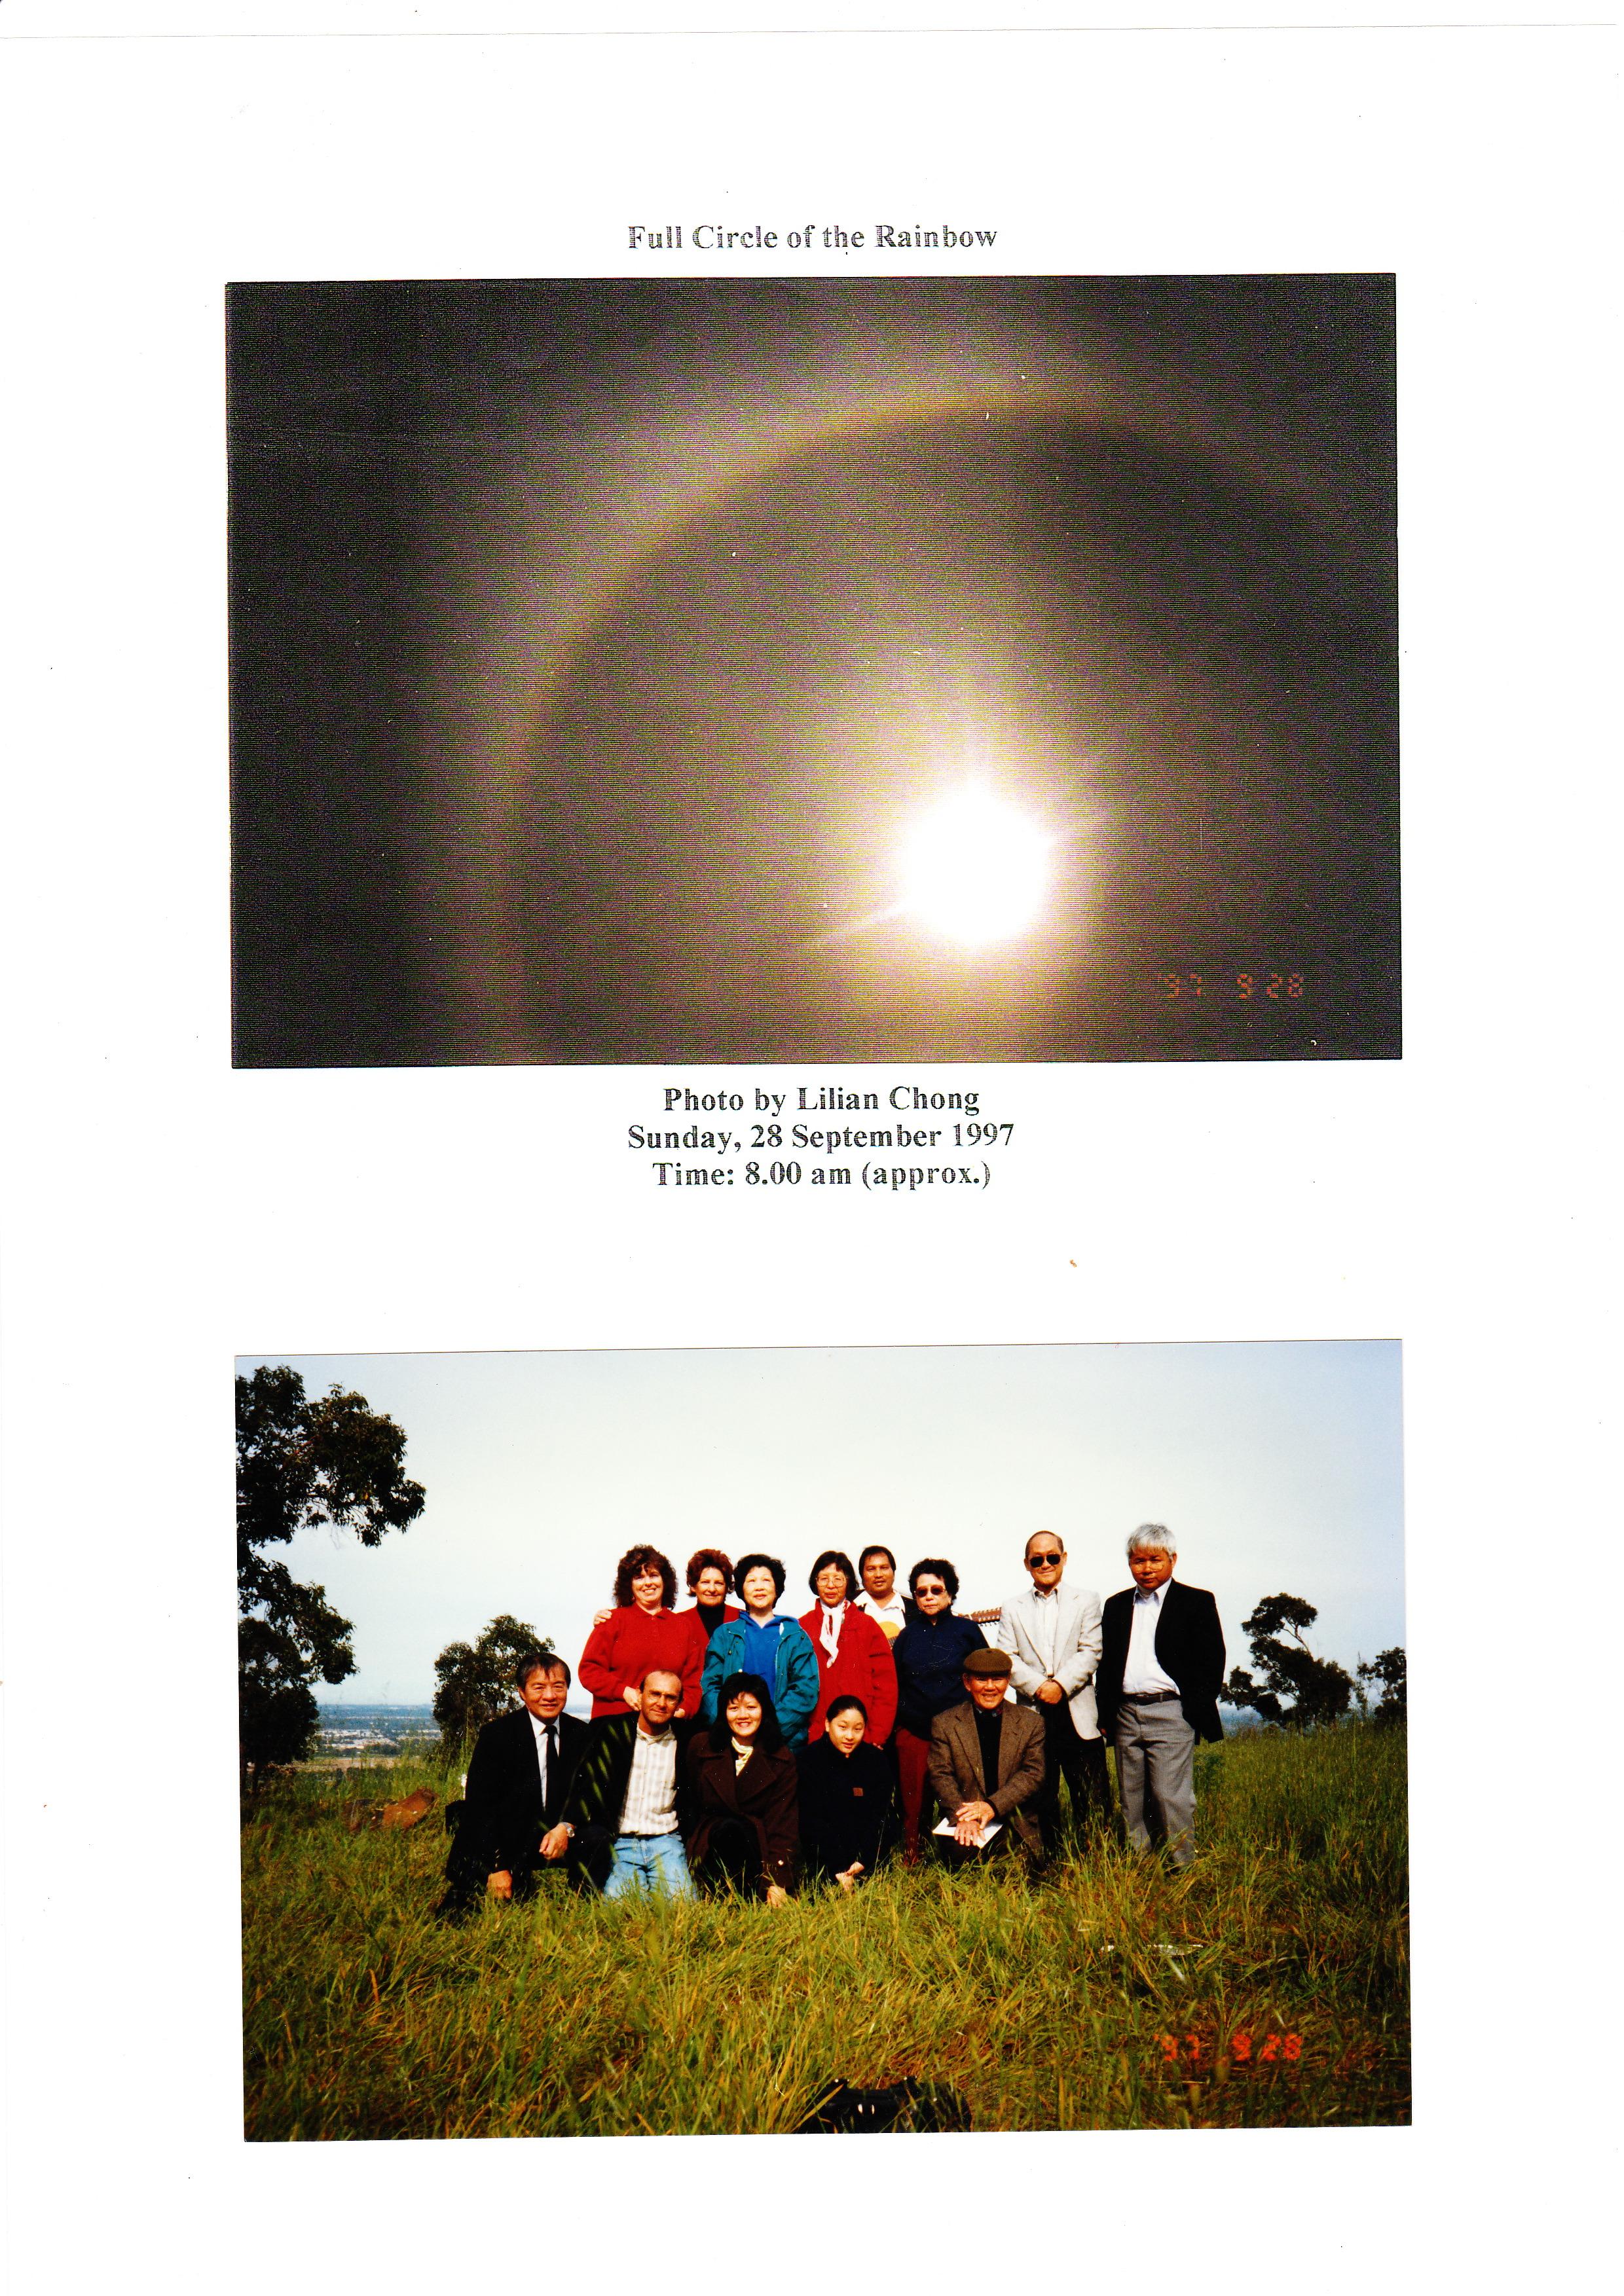 Witnessing the rare full circle of the rainbow p21chongs blog the biocorpaavc